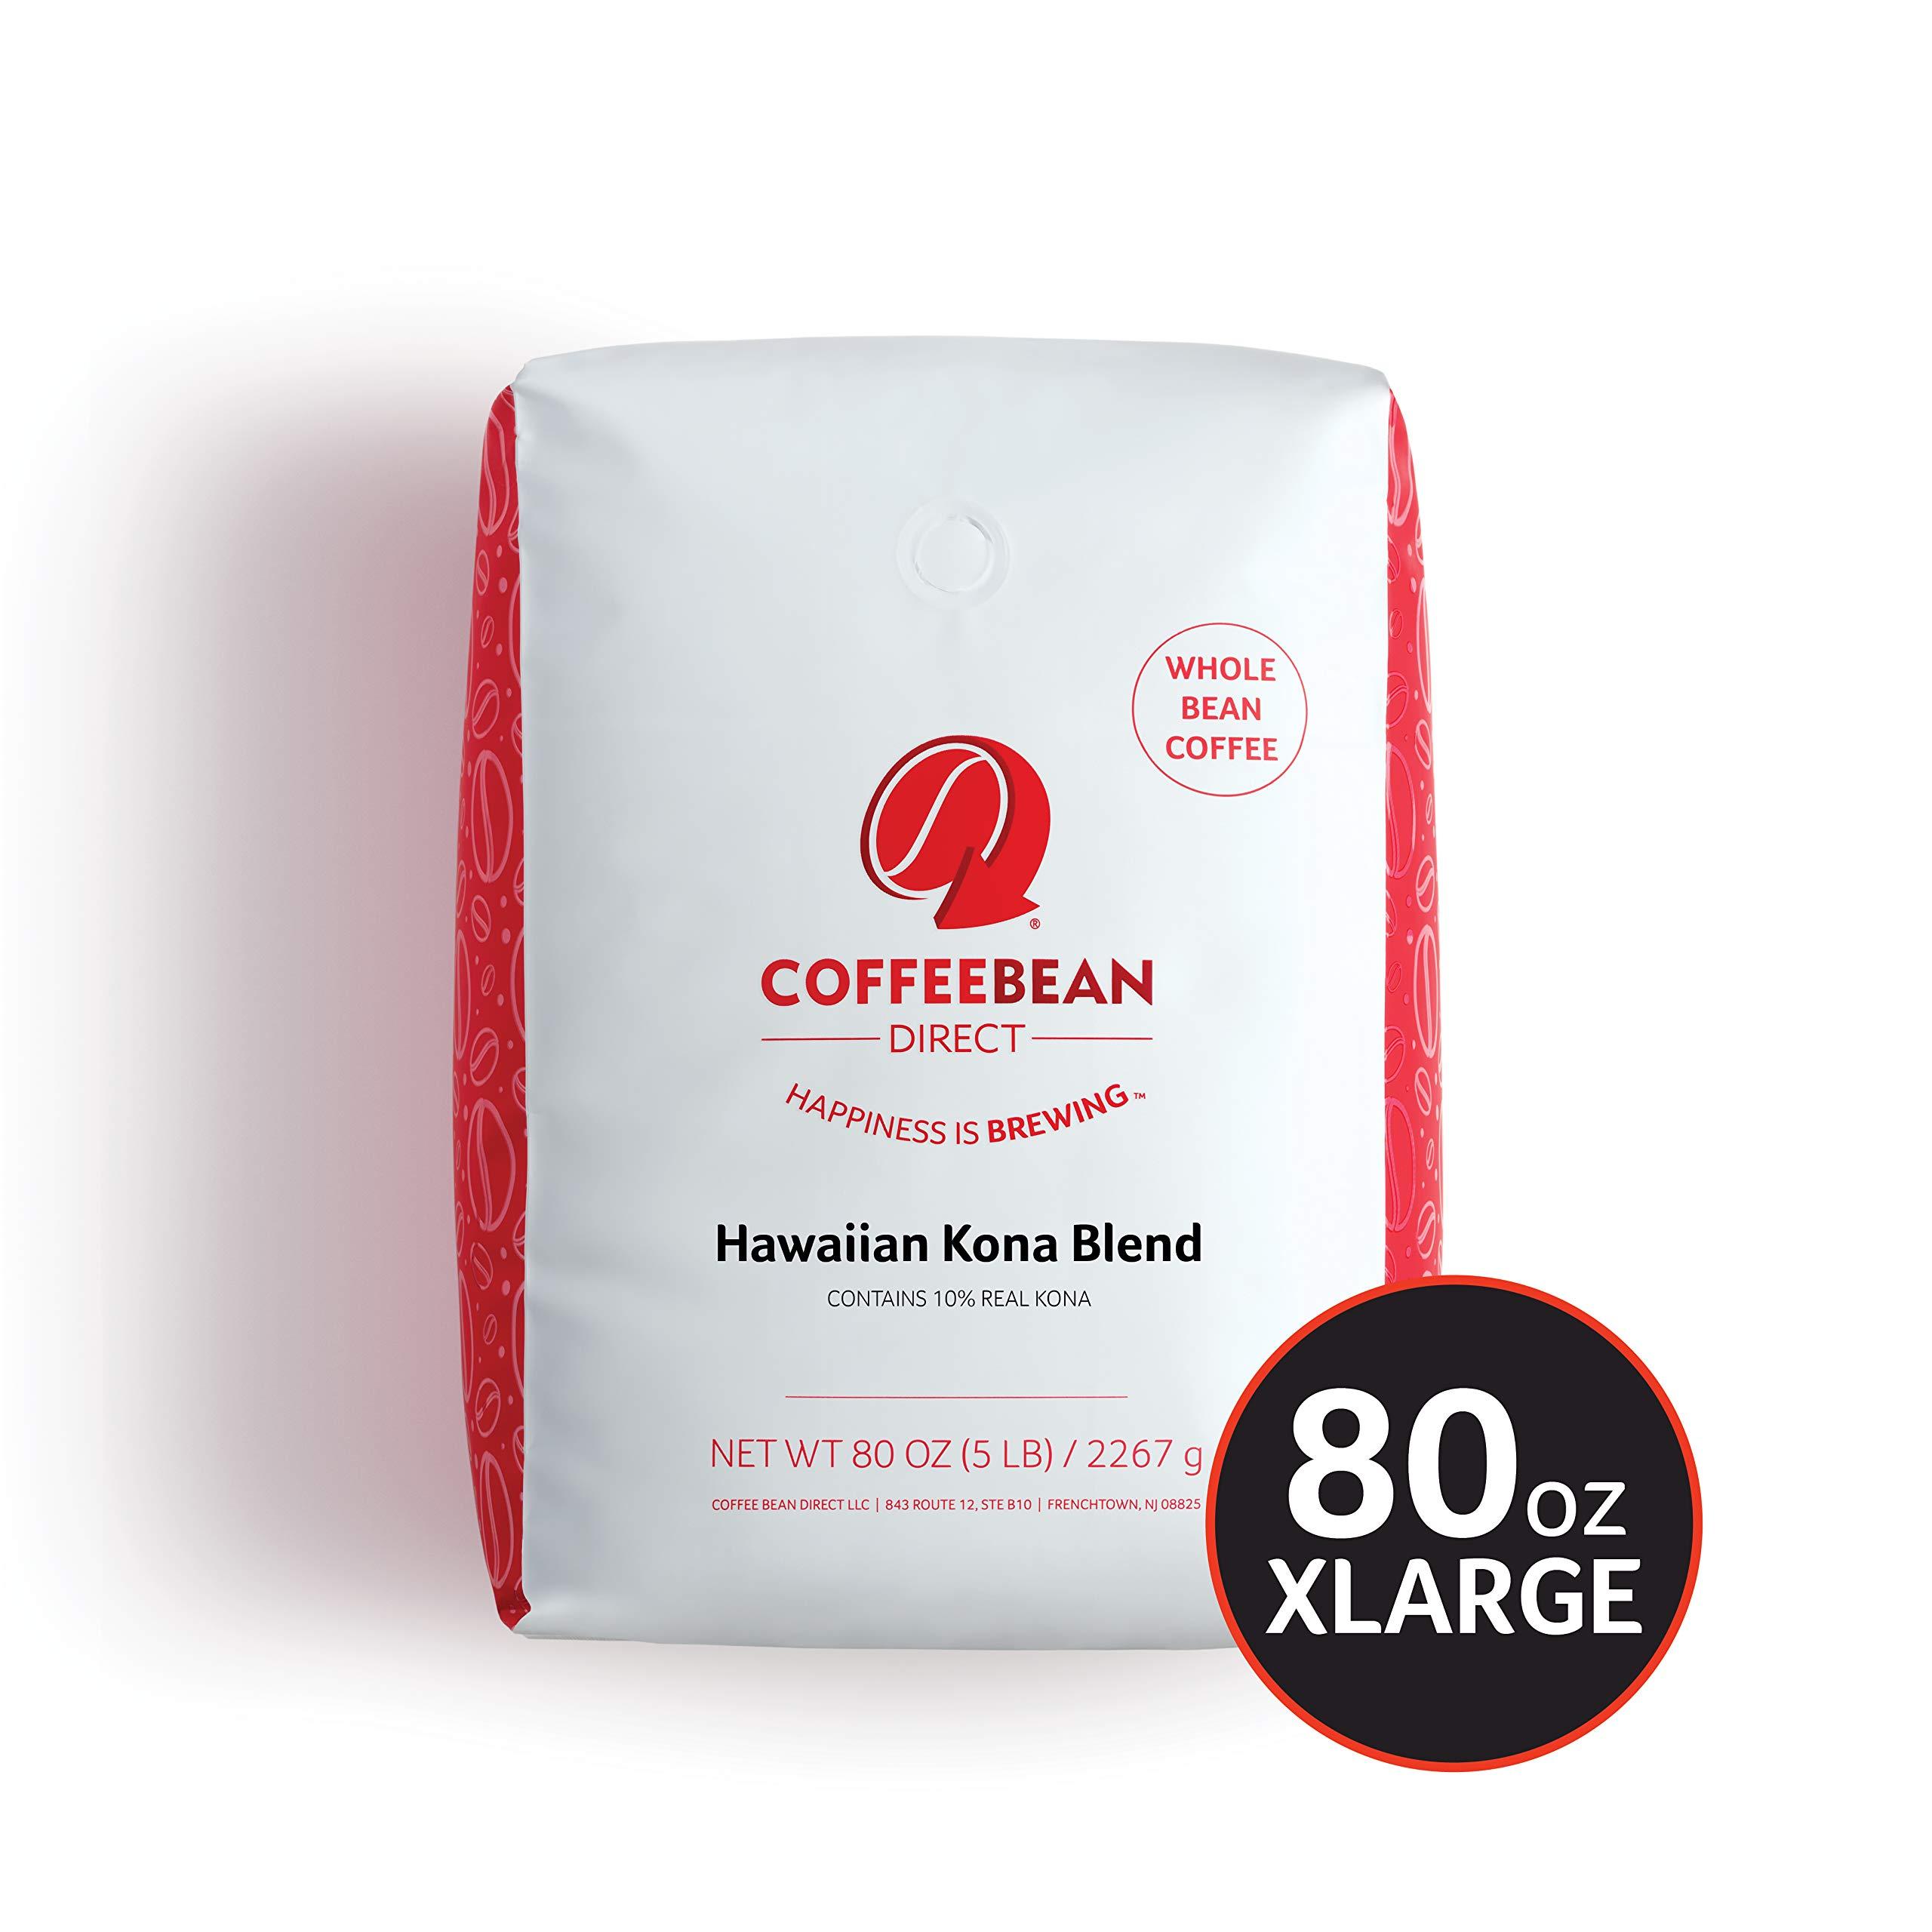 Coffee Bean Direct Hawaiian Kona Blend Coffee, Light Roast, Whole Bean, 5 Pound by Coffee Bean Direct